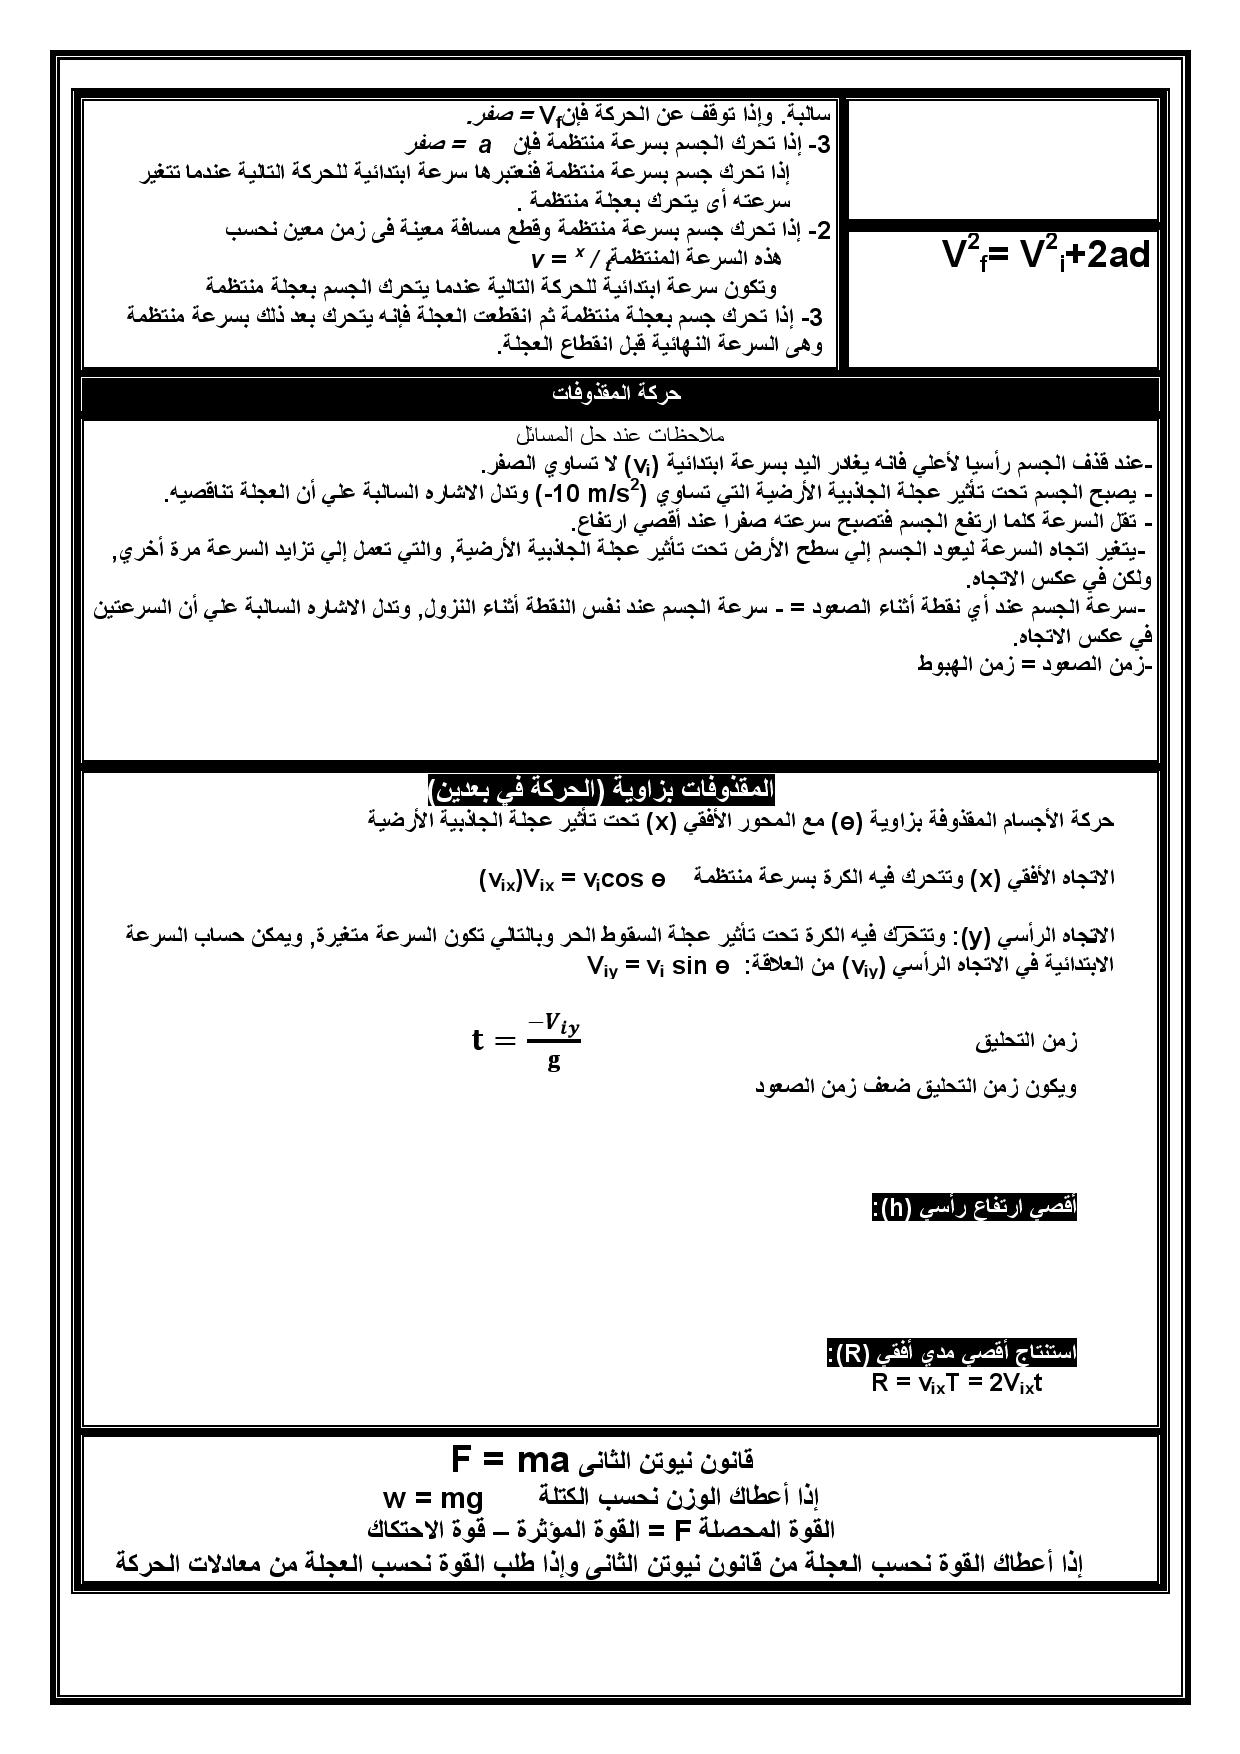 exam-eg.com_1462977506615.jpg